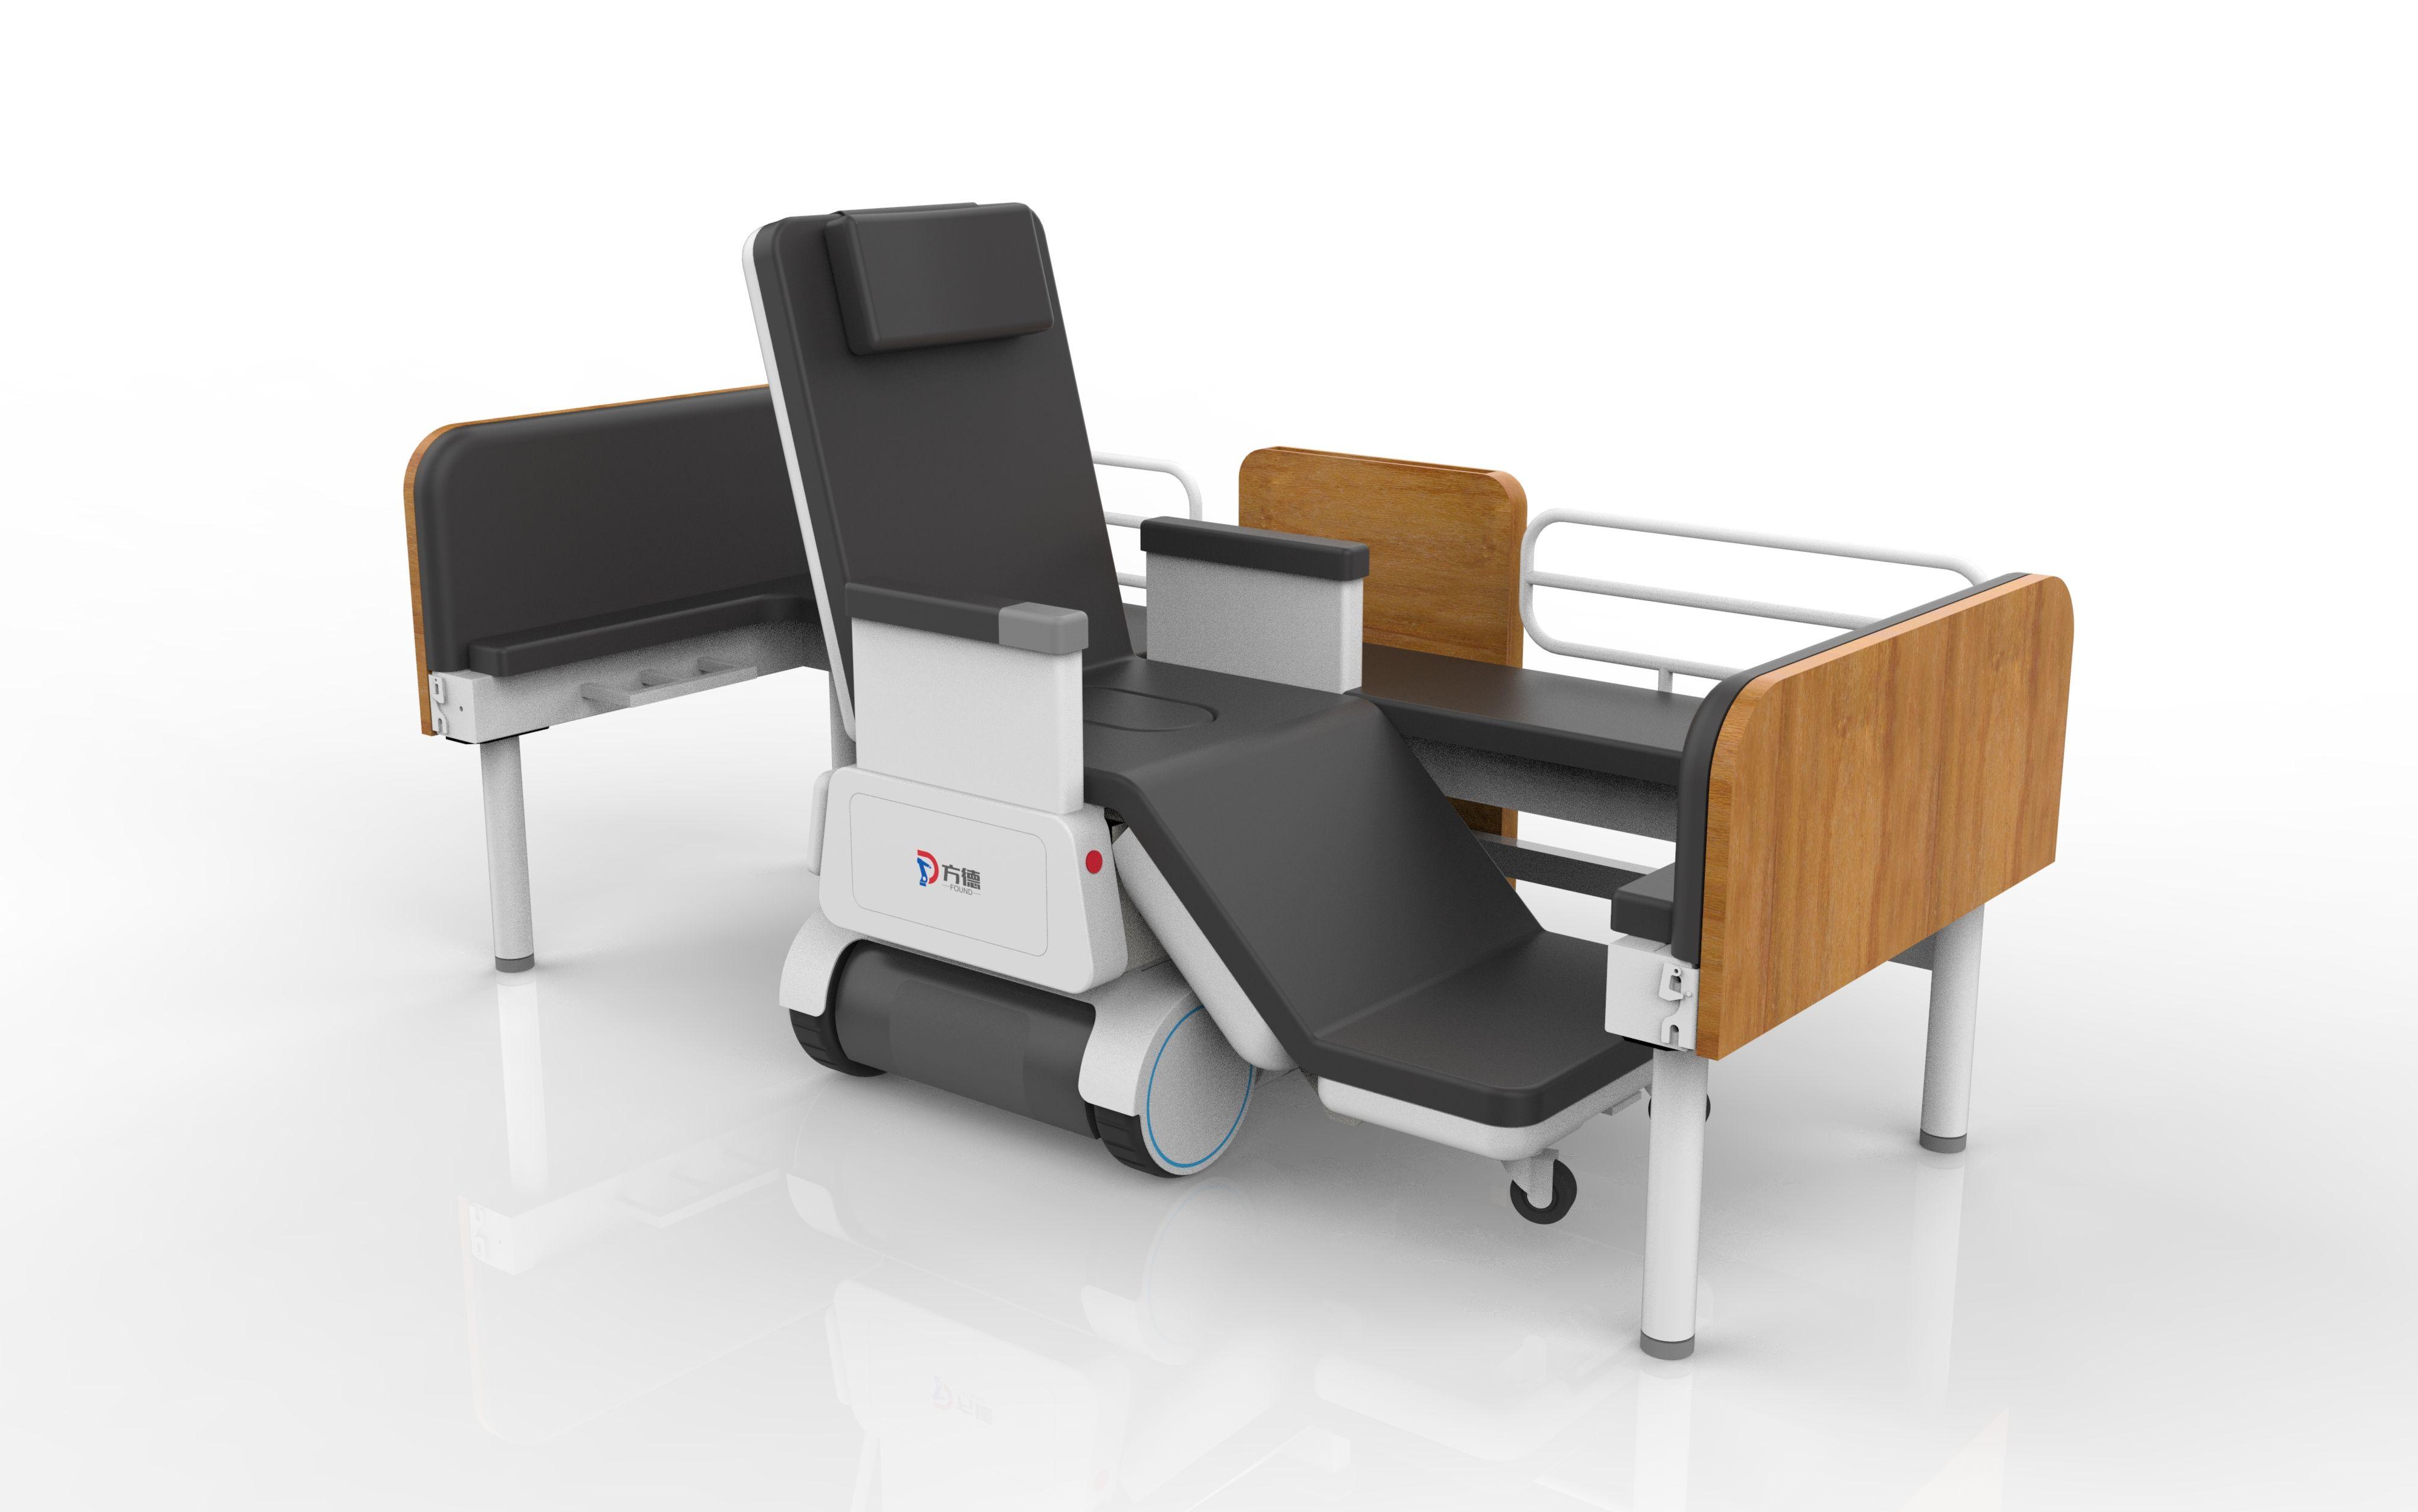 This Robot Integrates Multi Functional Nursing Bed Intelligent